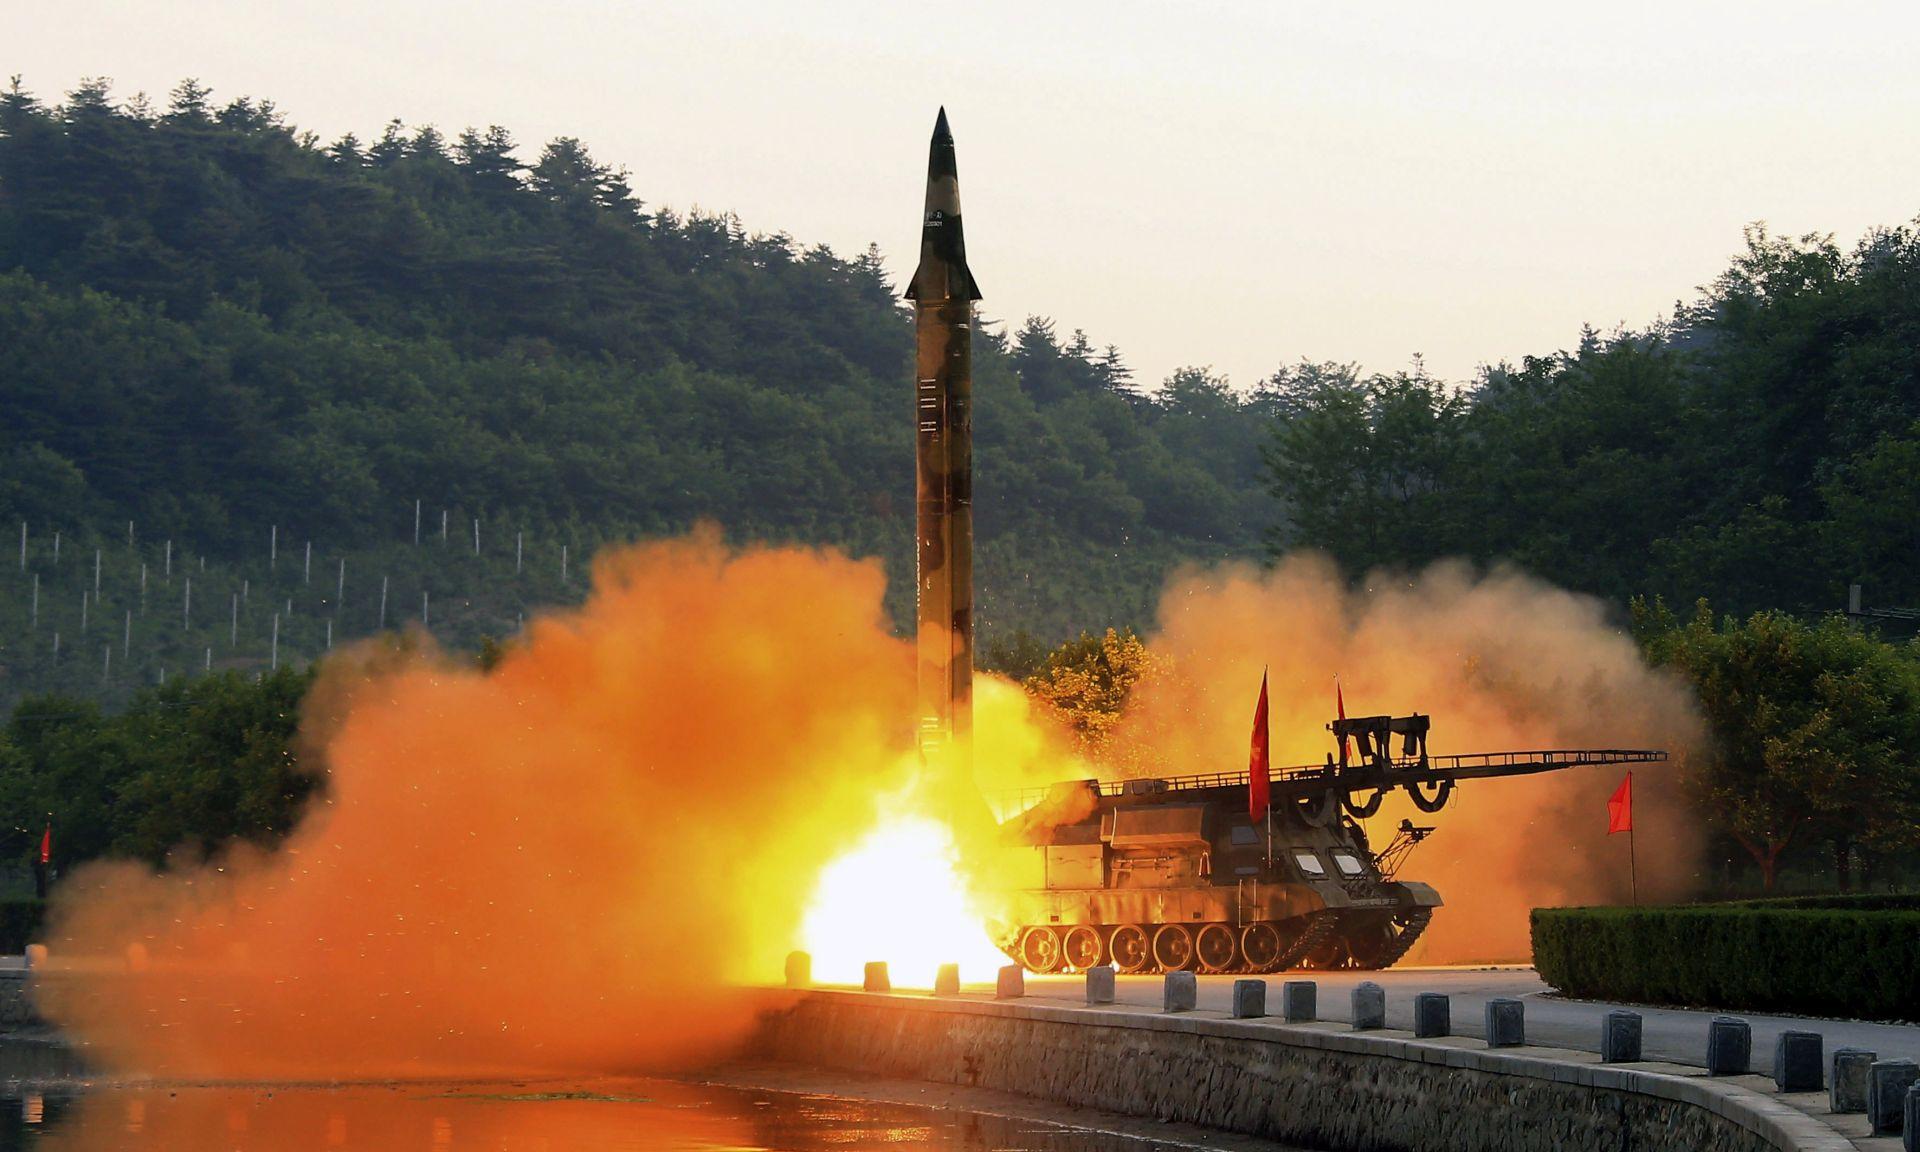 Sjeverna Koreja objavila da je spremna lansirati interkontinentalne rakete